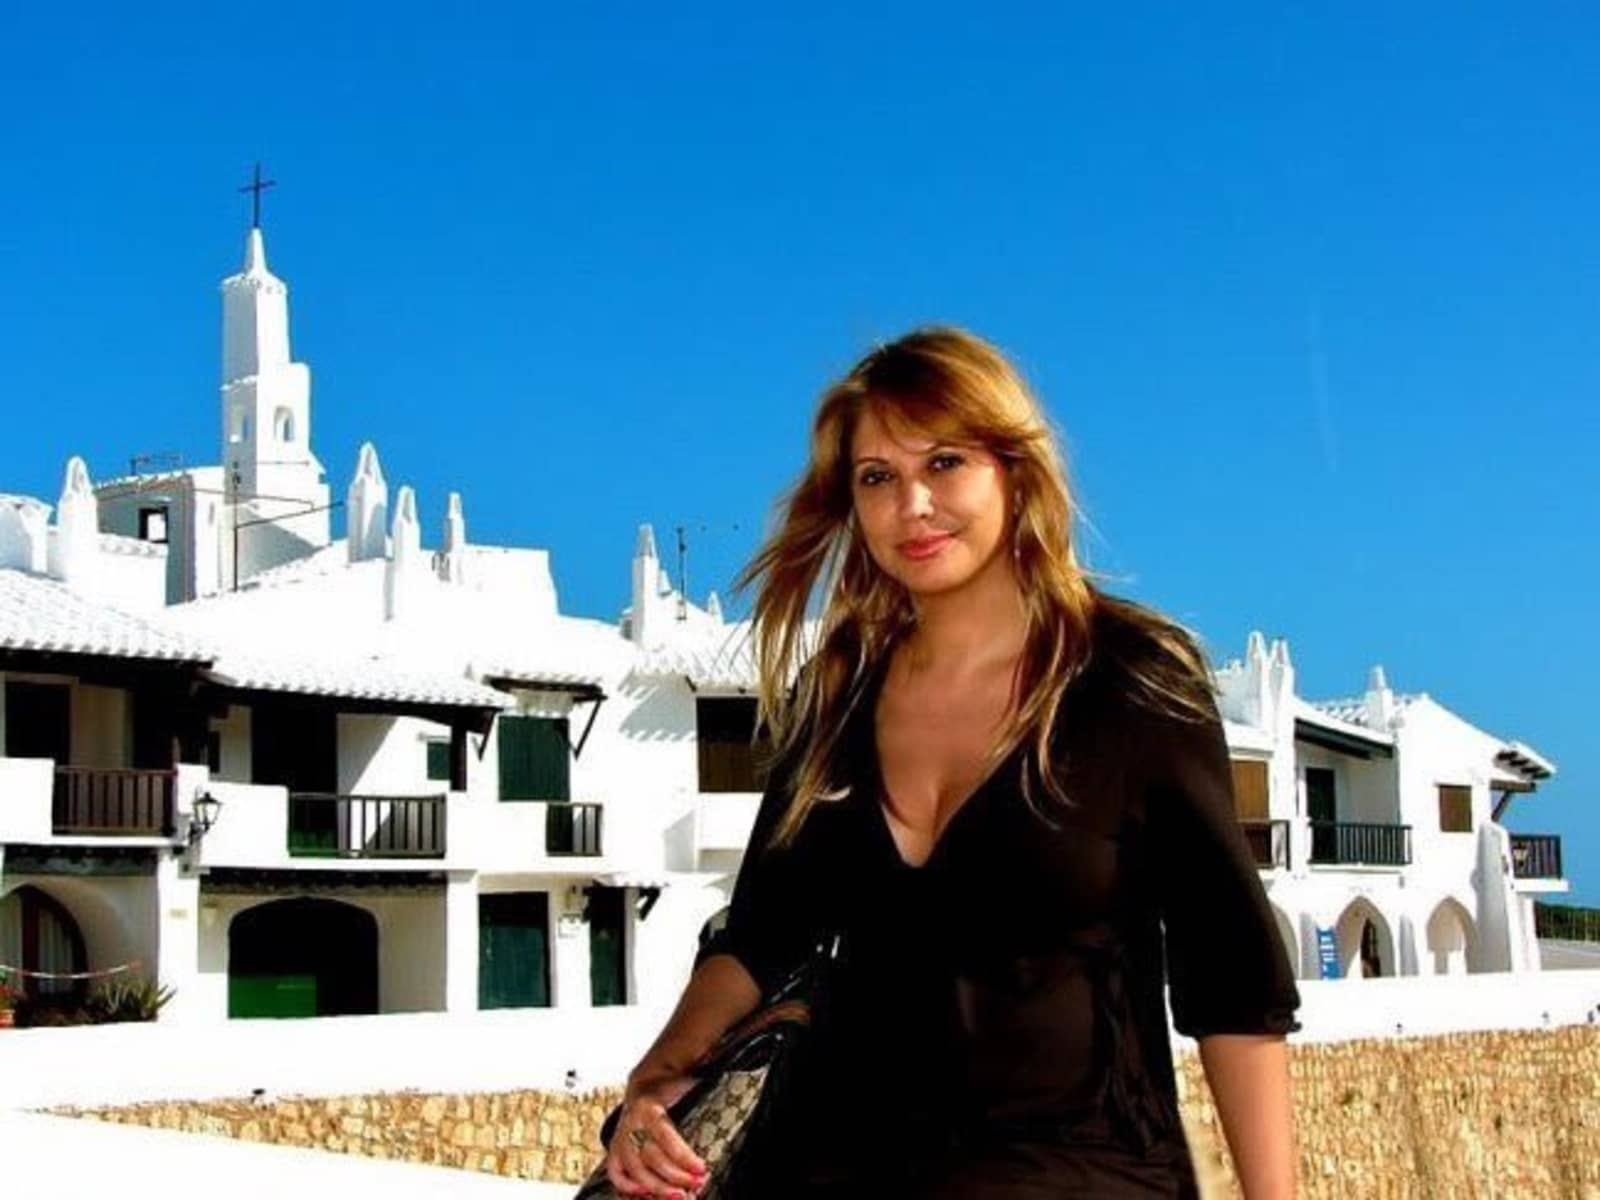 Carlla from Palma, Spain